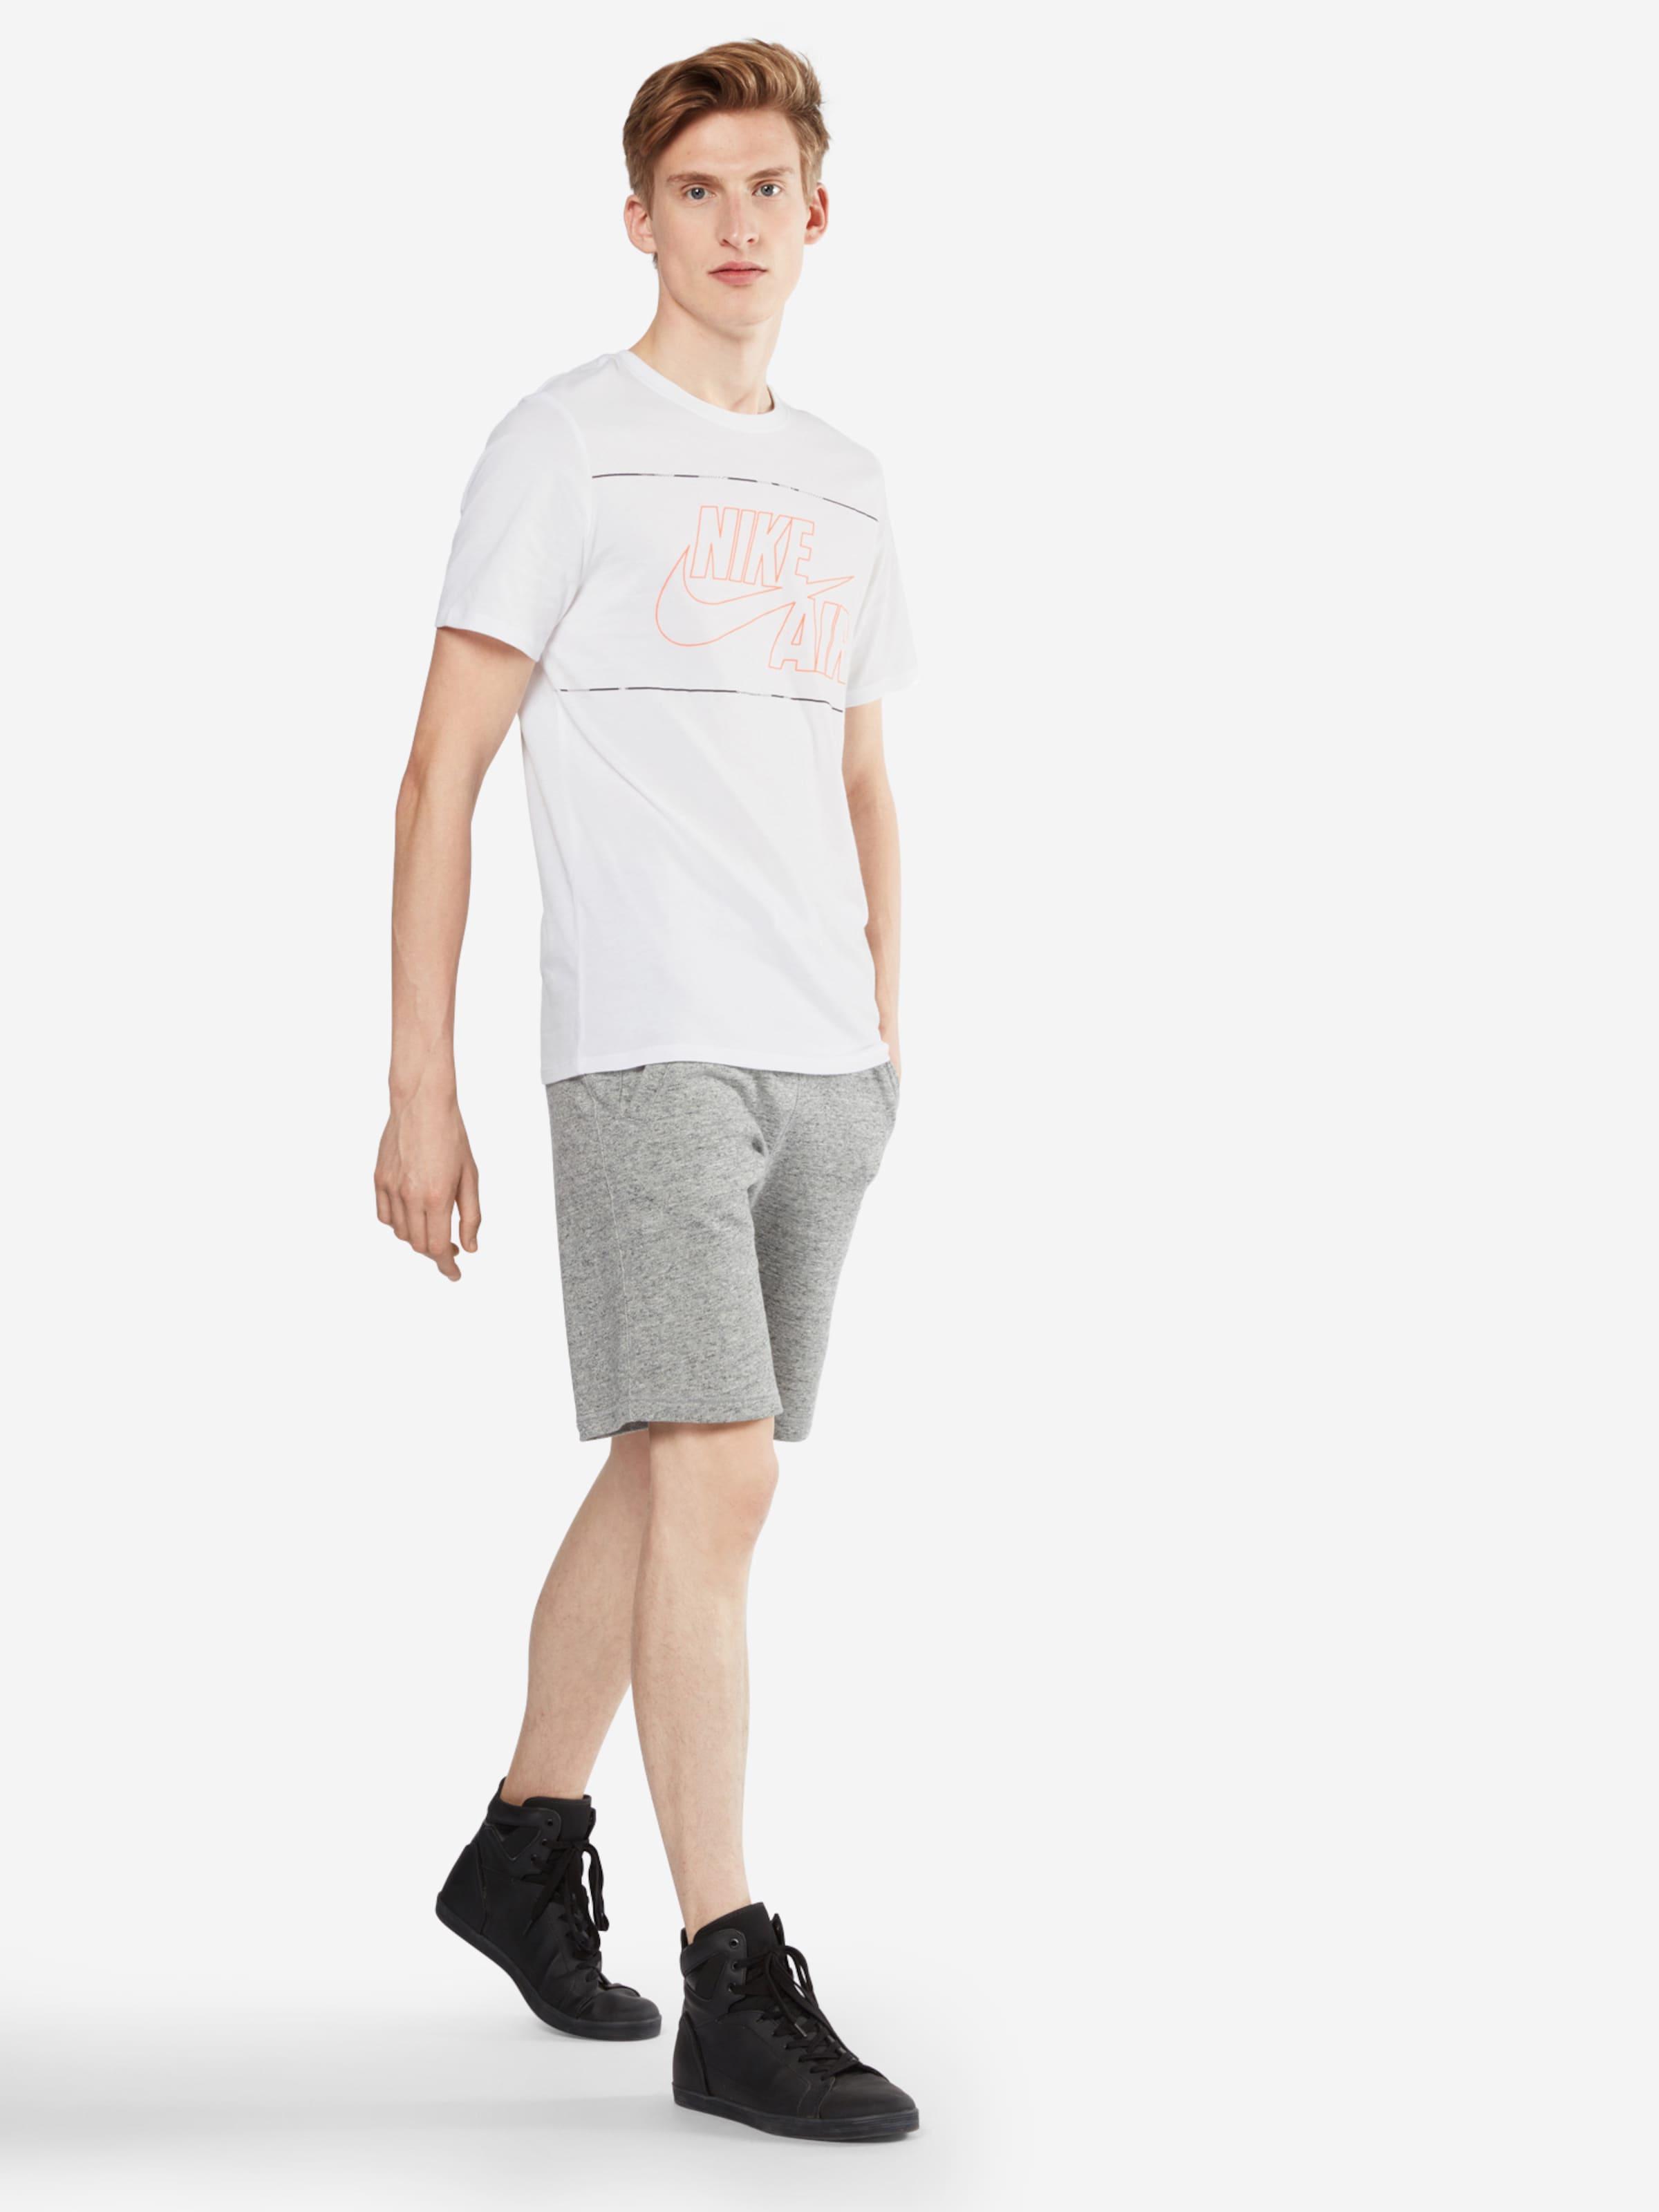 Freies Verschiffen Große Diskont Nike Sportswear T-Shirt 'M NK AIR TEE 1' Wie Viel Online Billig Footlocker 4ZIV006vT